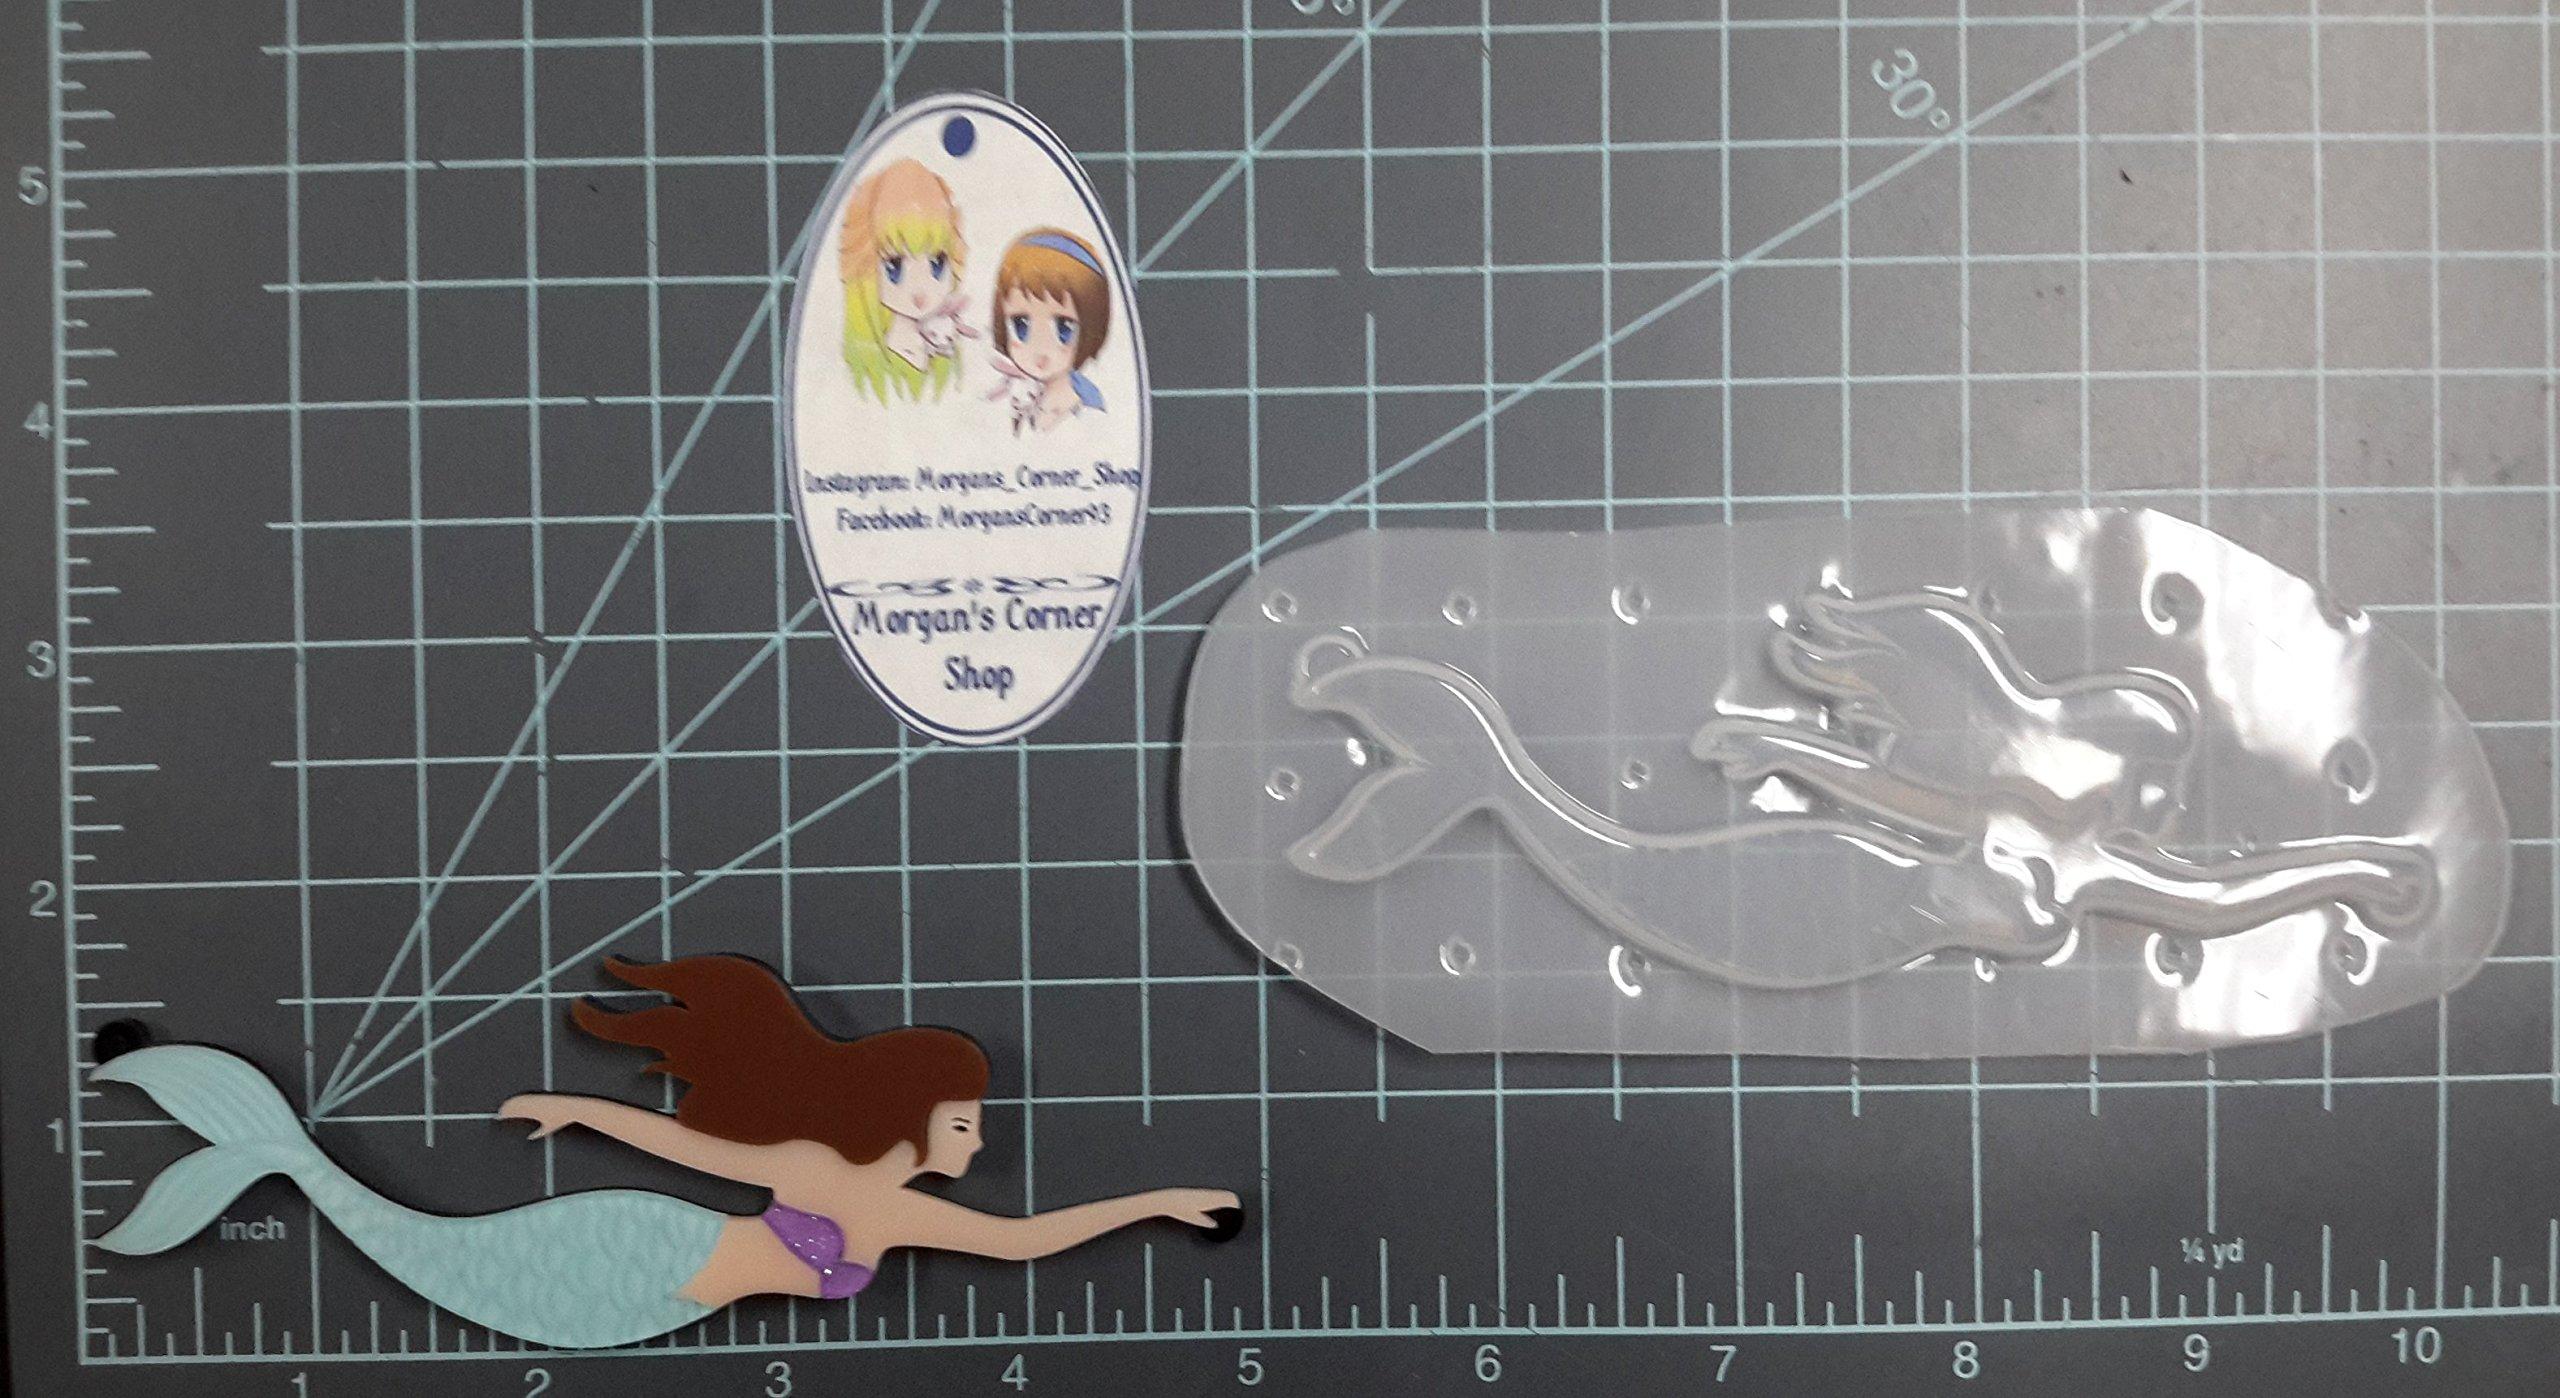 Swimming Mermaid Plastic Mold, Resin Mold, Soap Mold, clay mold, candle mold, mermaid mold, jewelry mold, resin jewelry